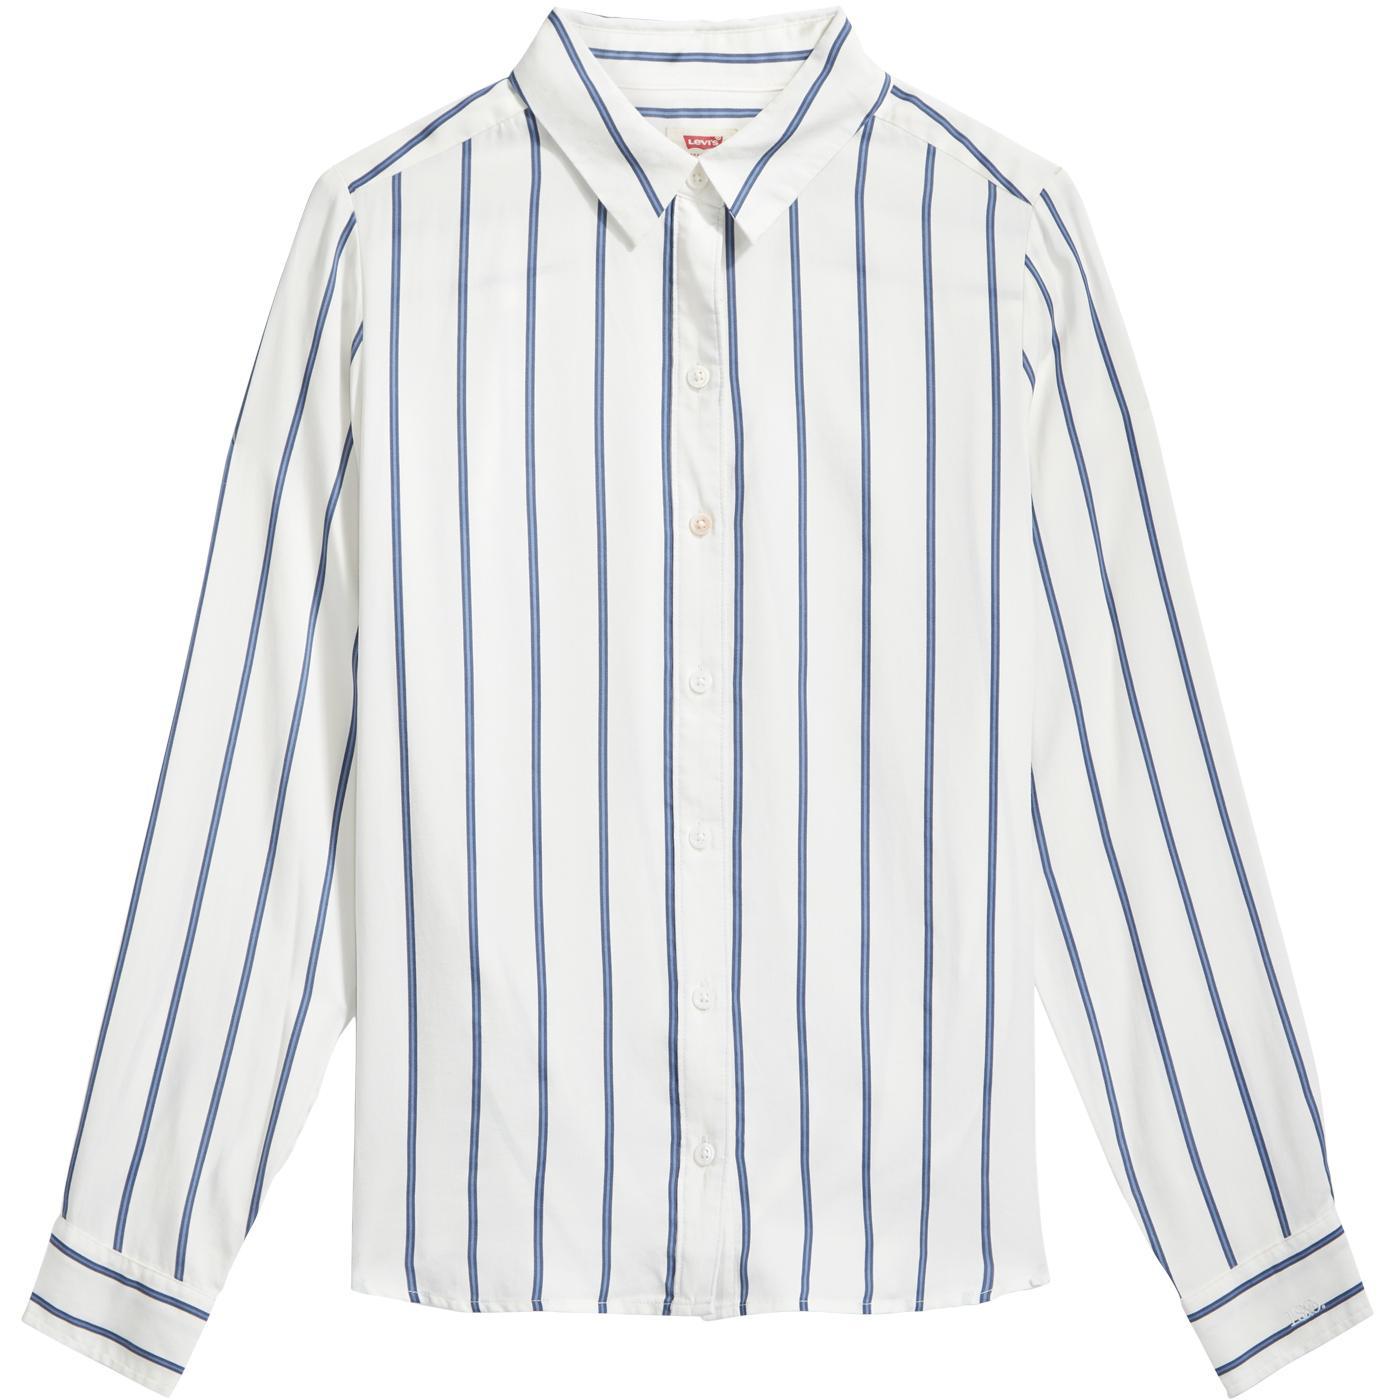 LEVI'S Women's Retro Stripe Classic Shirt (SRST)